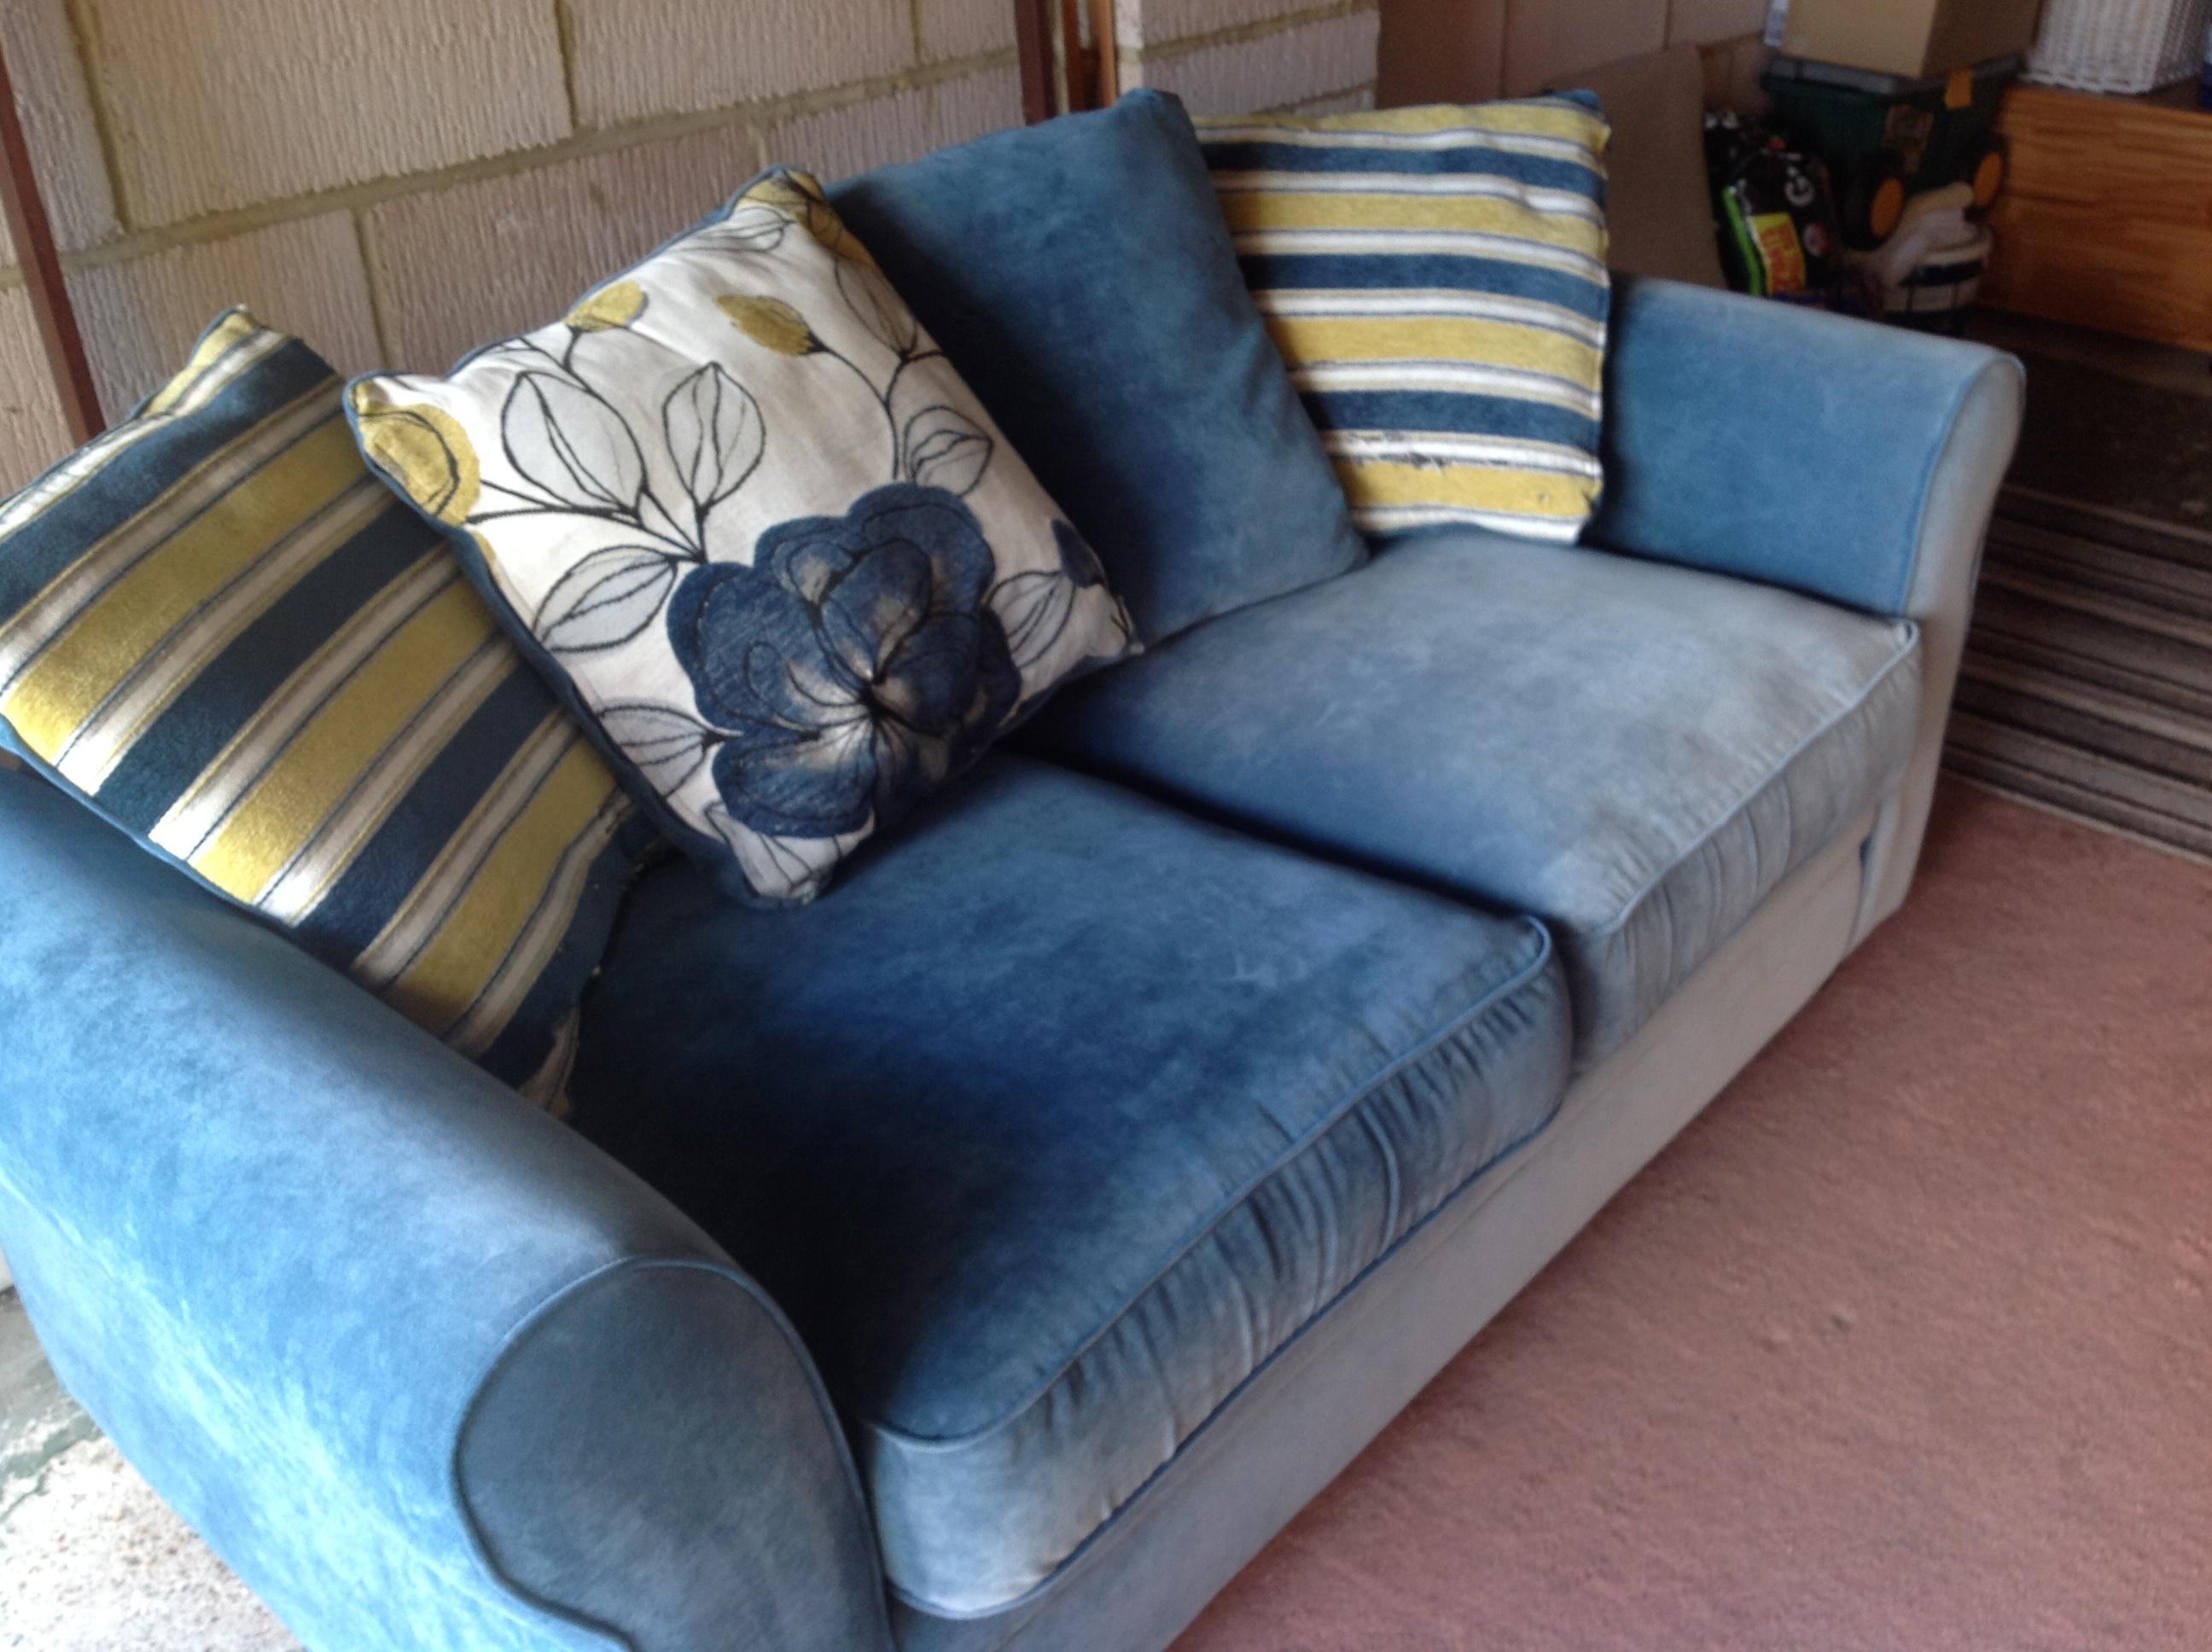 Miraculous Sofa Bed In Eastbourne Friday Ad Inzonedesignstudio Interior Chair Design Inzonedesignstudiocom